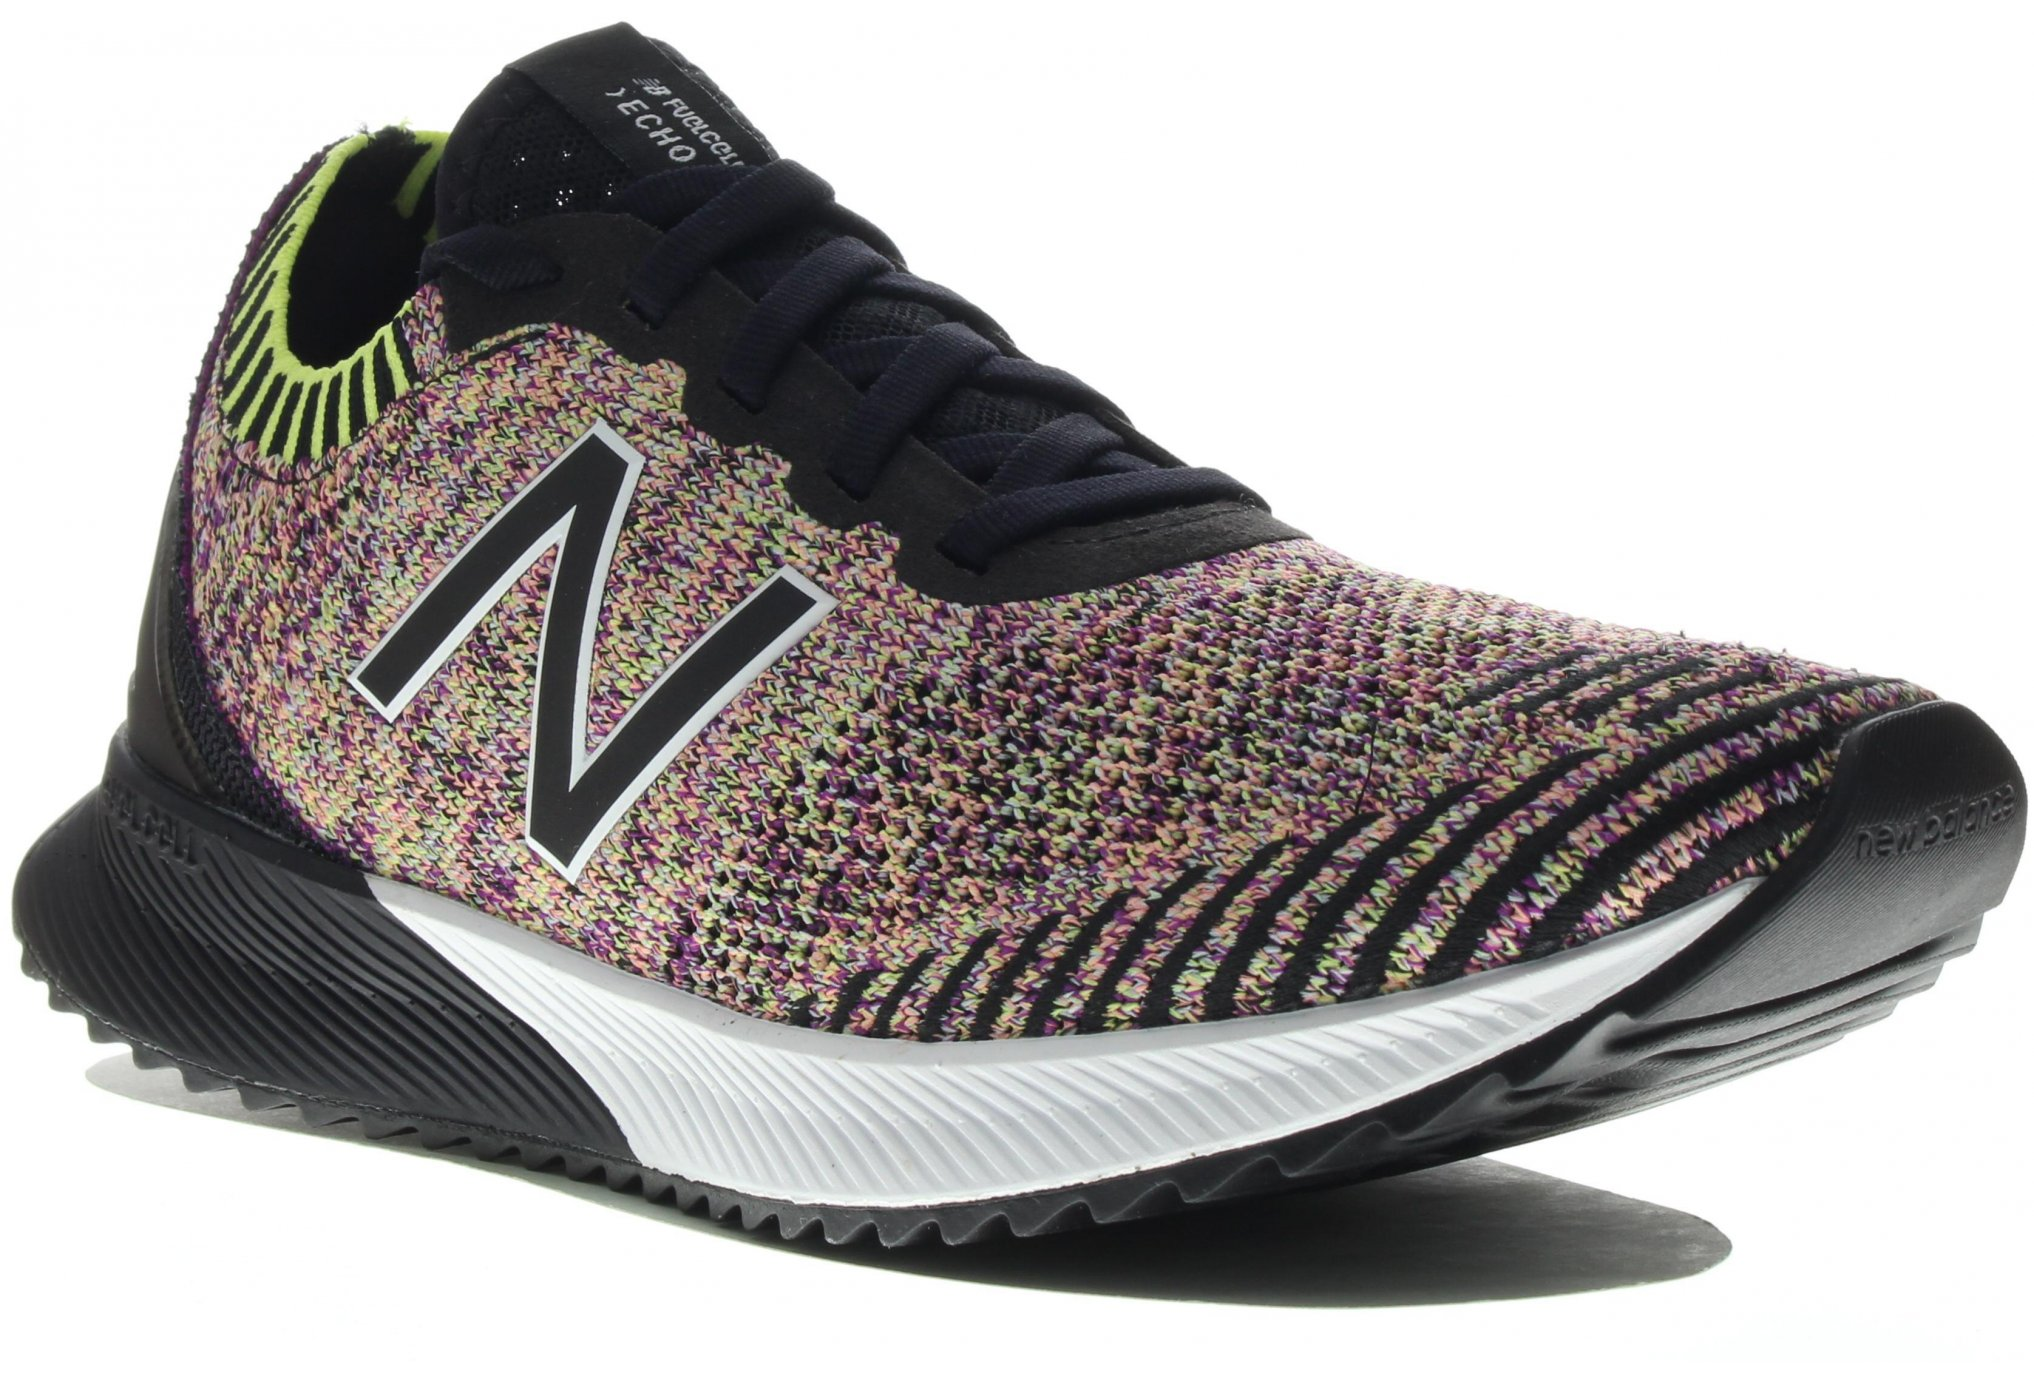 New Balance FuelCell Echo Chaussures running femme